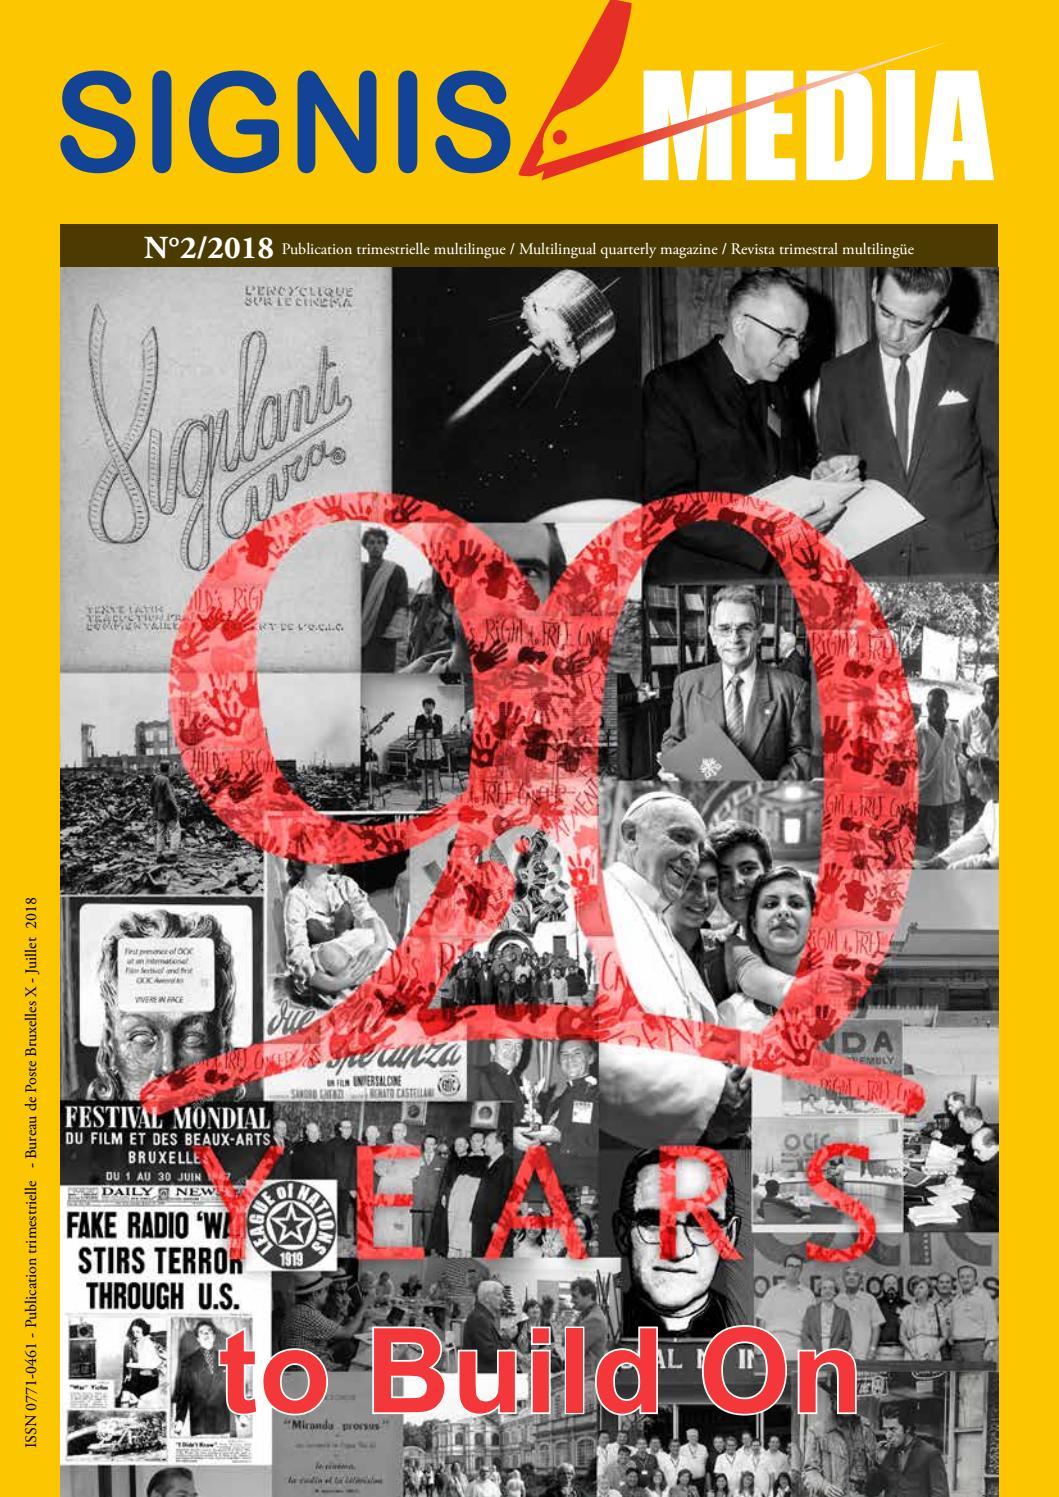 Amor En Fin Movie Online signis media: 90 years to build onsignis - issuu